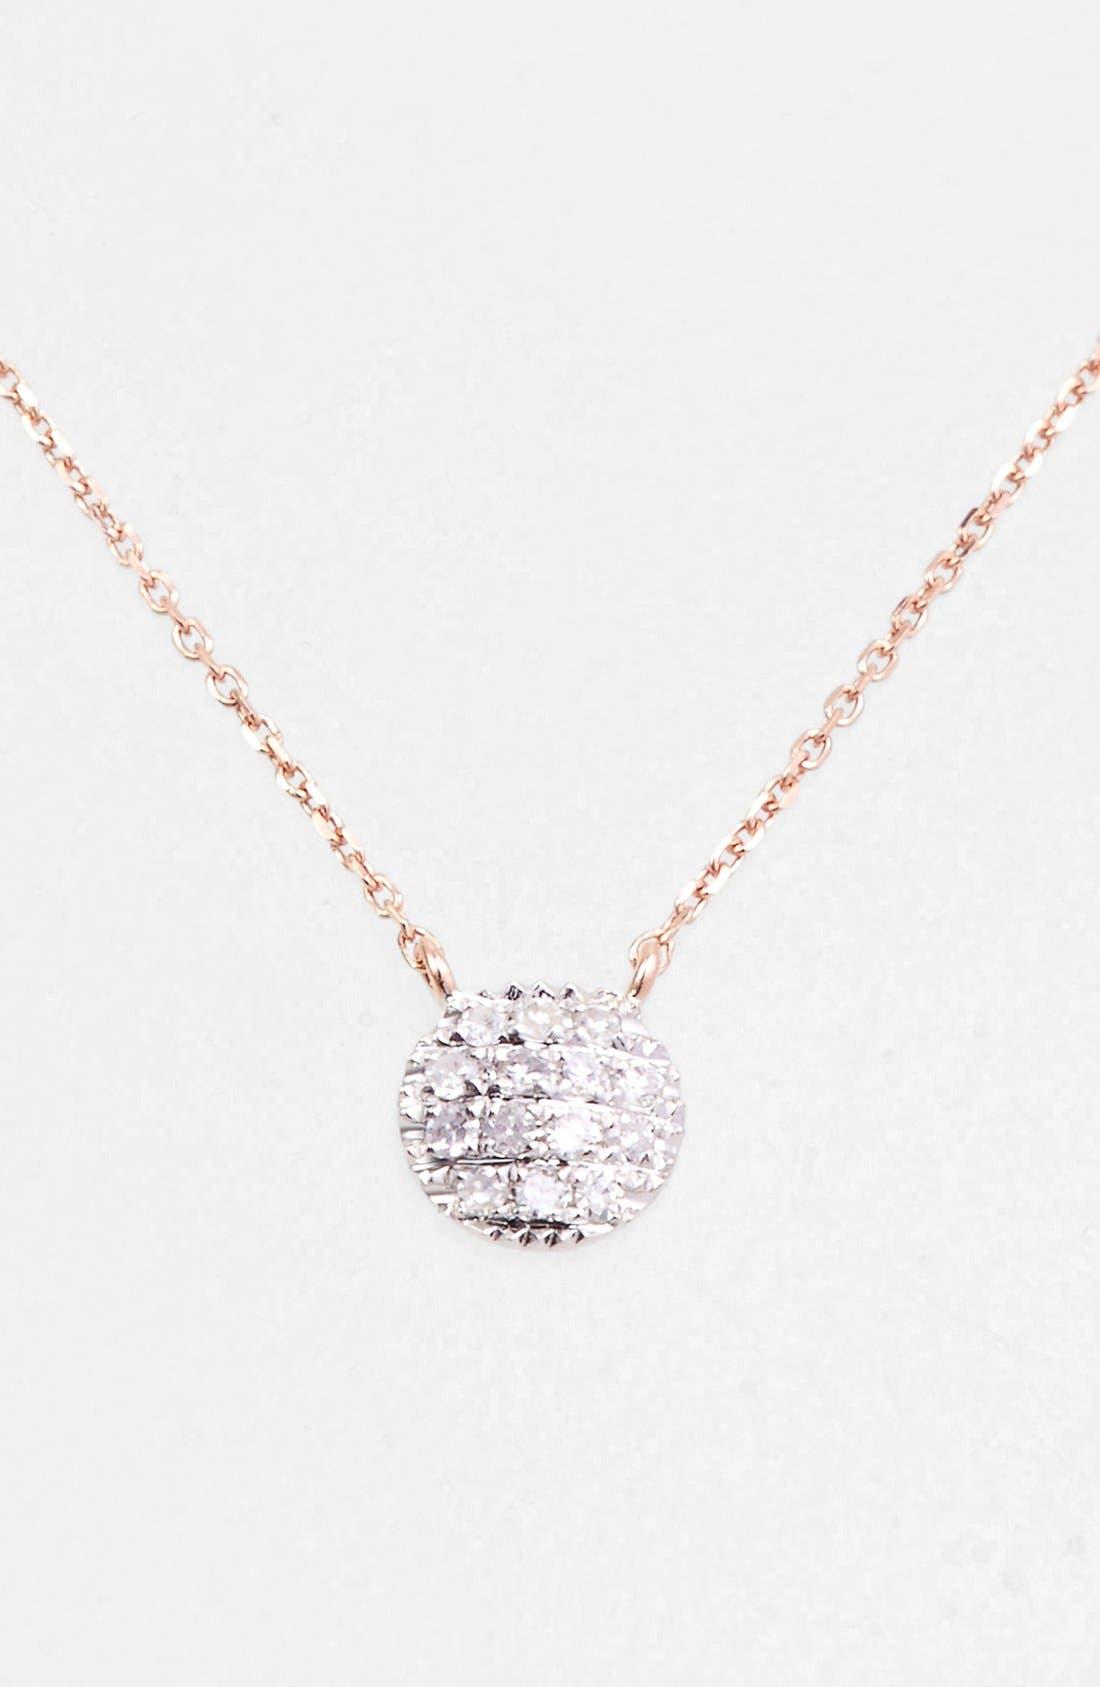 Main Image - Dana Rebecca Designs 'Lauren Joy' Diamond Disc Pendant Necklace